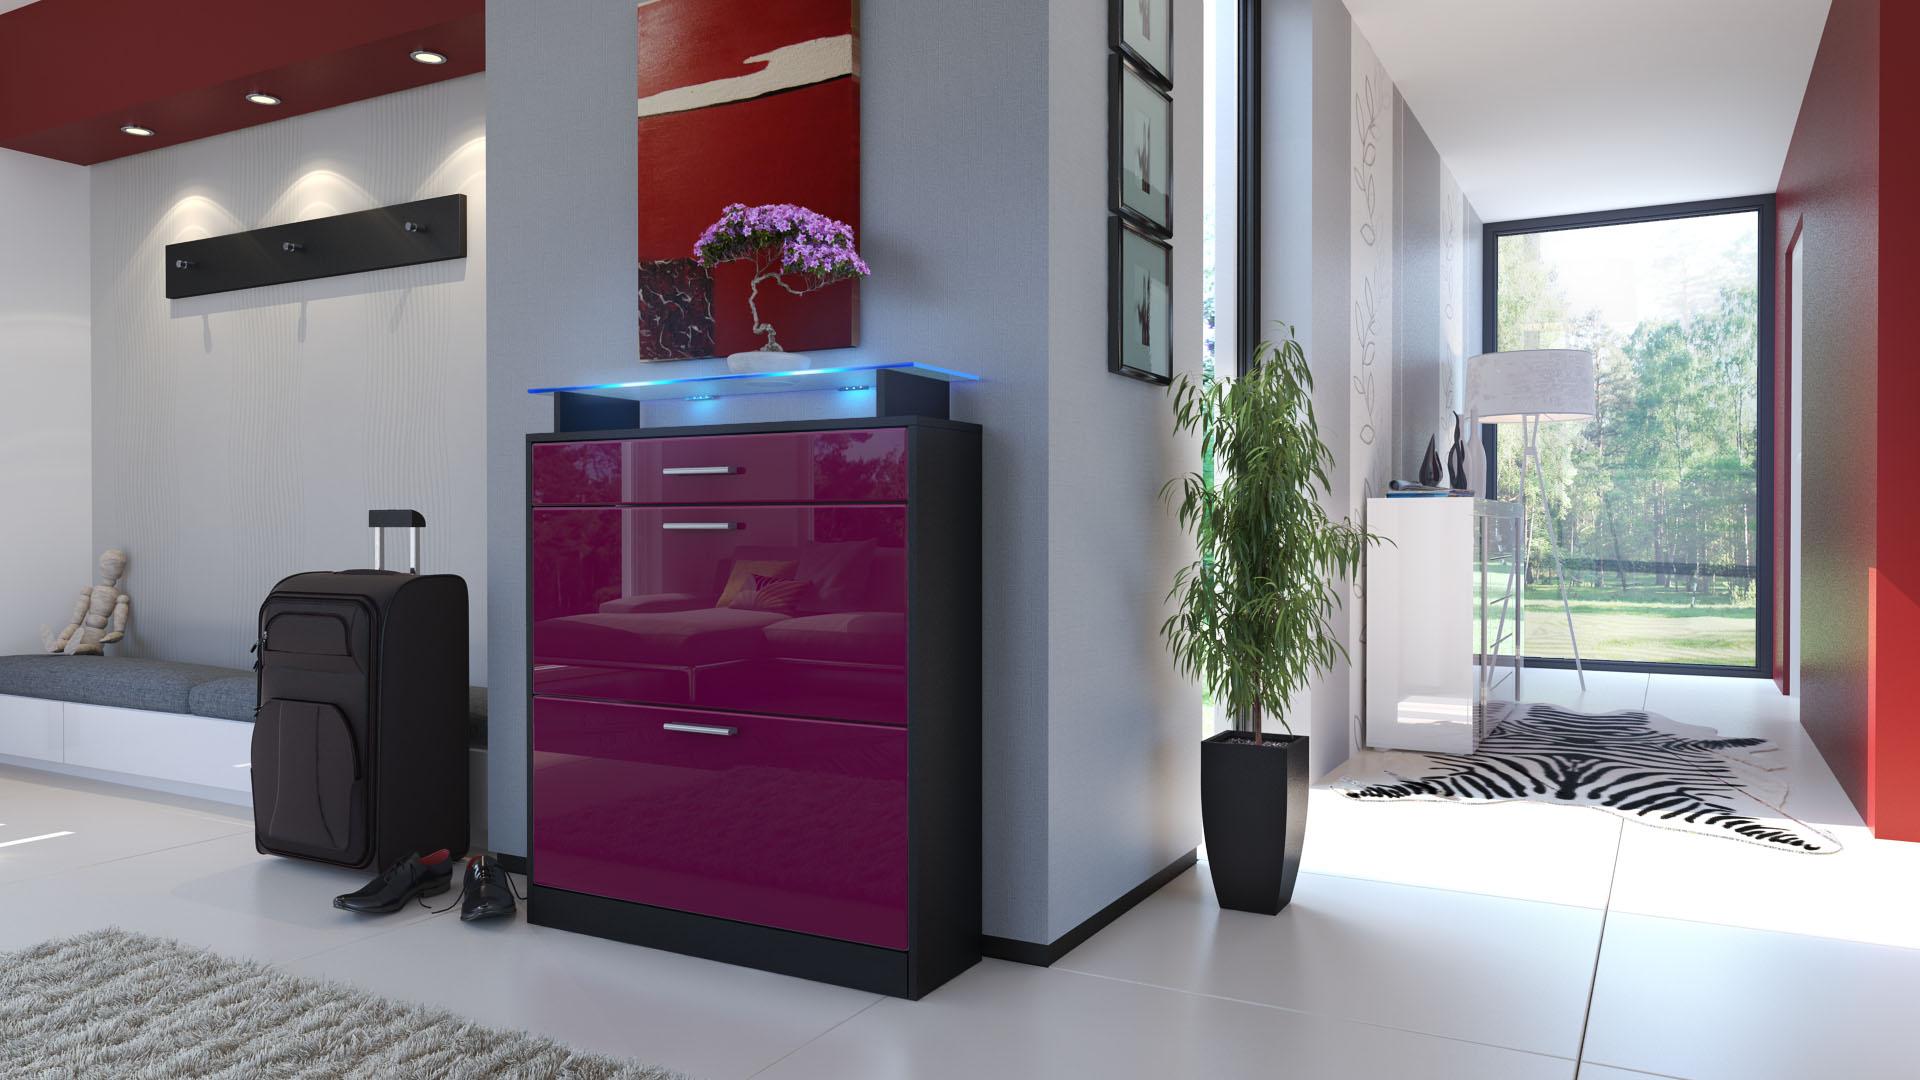 schuhschrank schuhkipper schuh regal loret schwarz. Black Bedroom Furniture Sets. Home Design Ideas